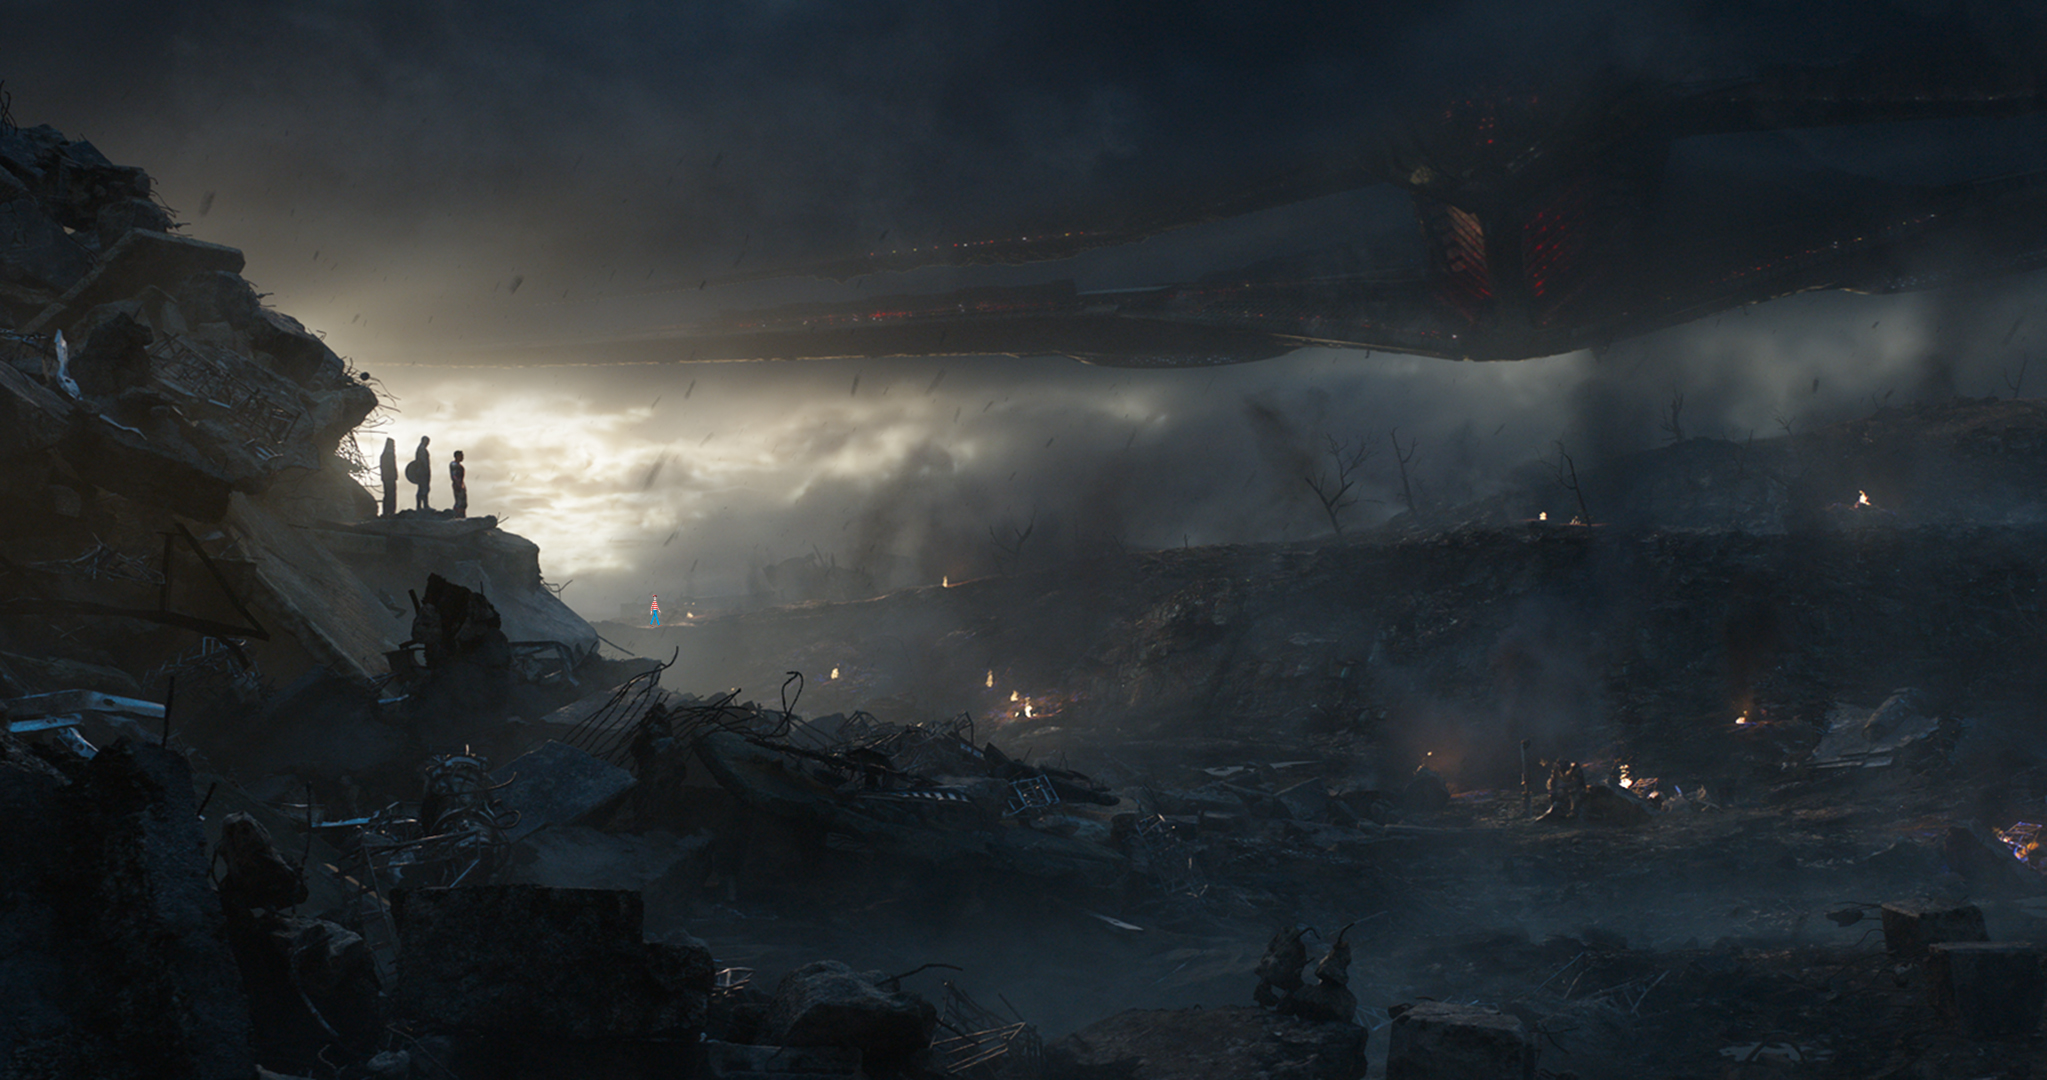 We Think We Found Nova In These Avengers: Endgame Stills